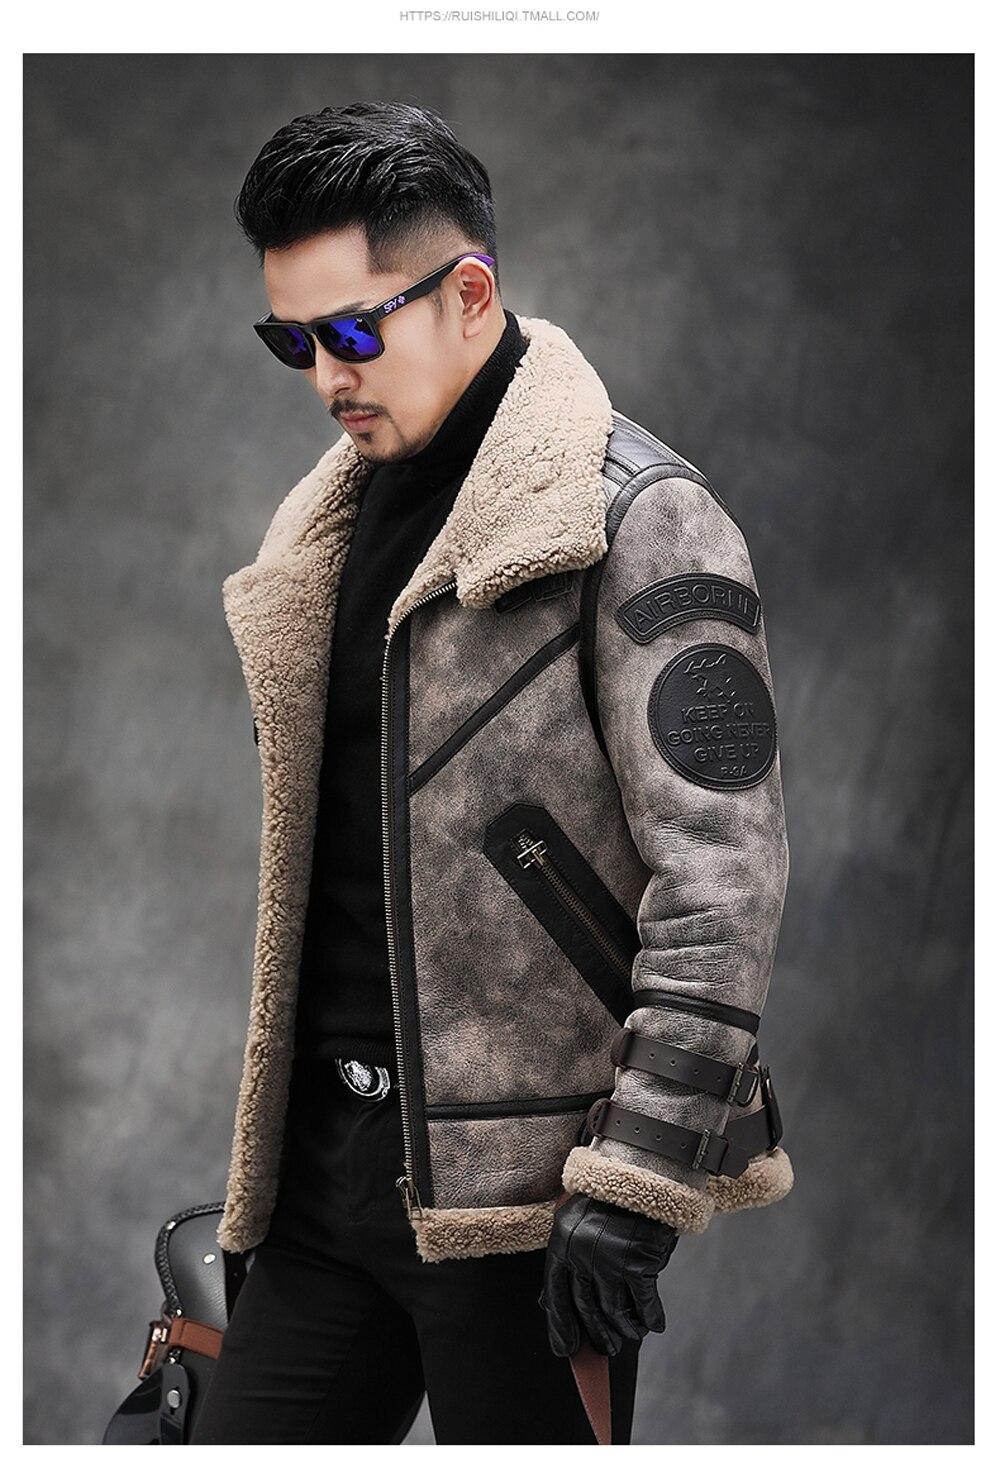 H41ffec3c413841c183c5bcfebc2bf332H 2019 Fashion 100% Quality Real Sheepskin Fur Men Coat Genuine Full Pelt Sheep Shearling Male Winter Jacket Brown Men Fur Outwear